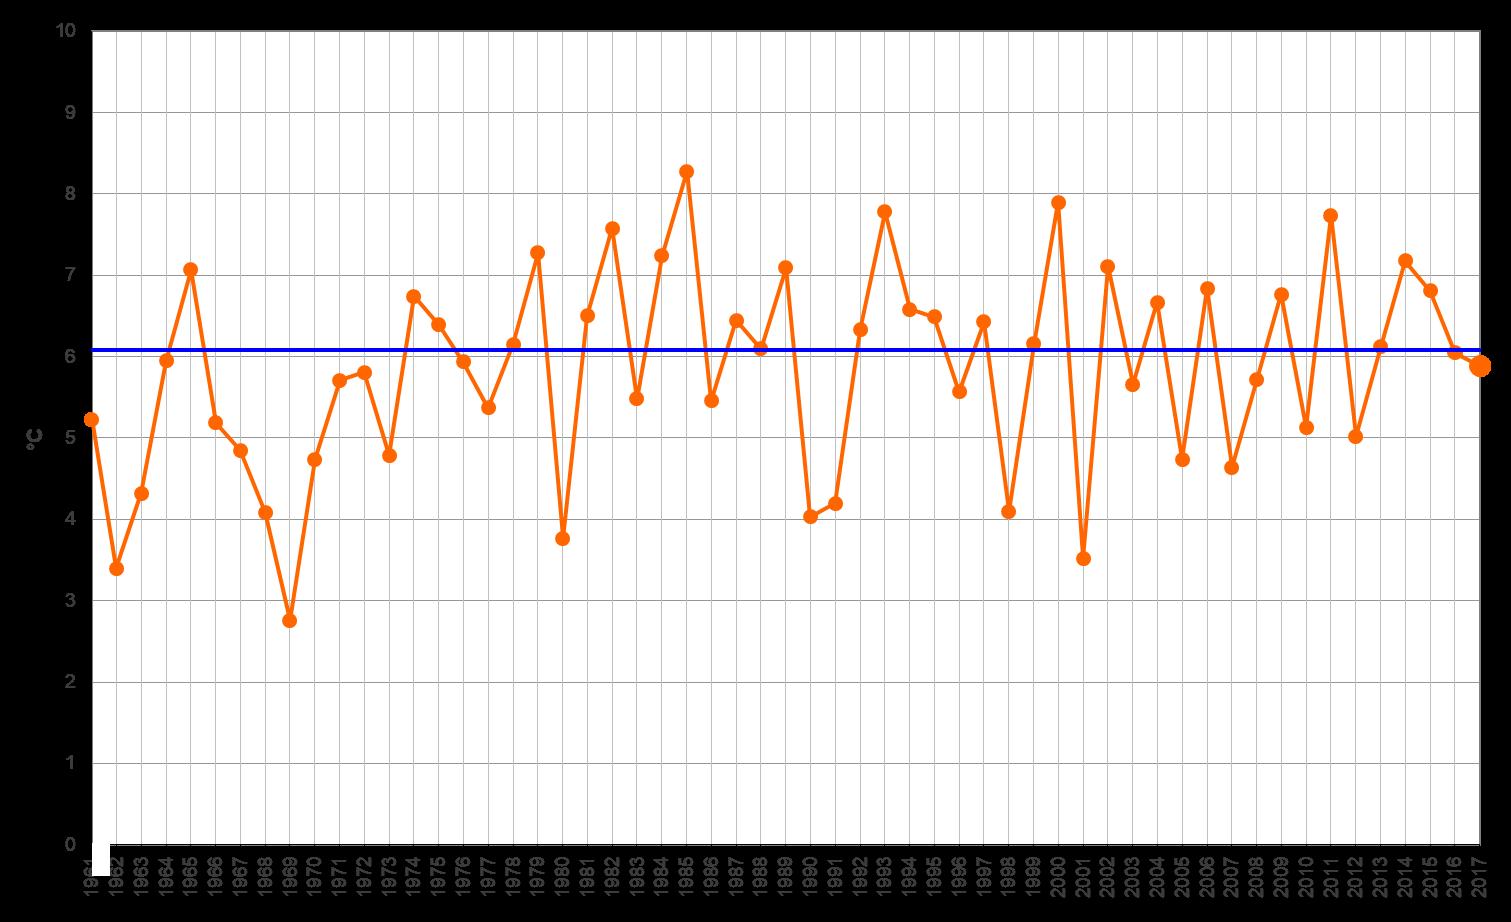 Meteo ASSAM Marche - temperatura mensile dicembre